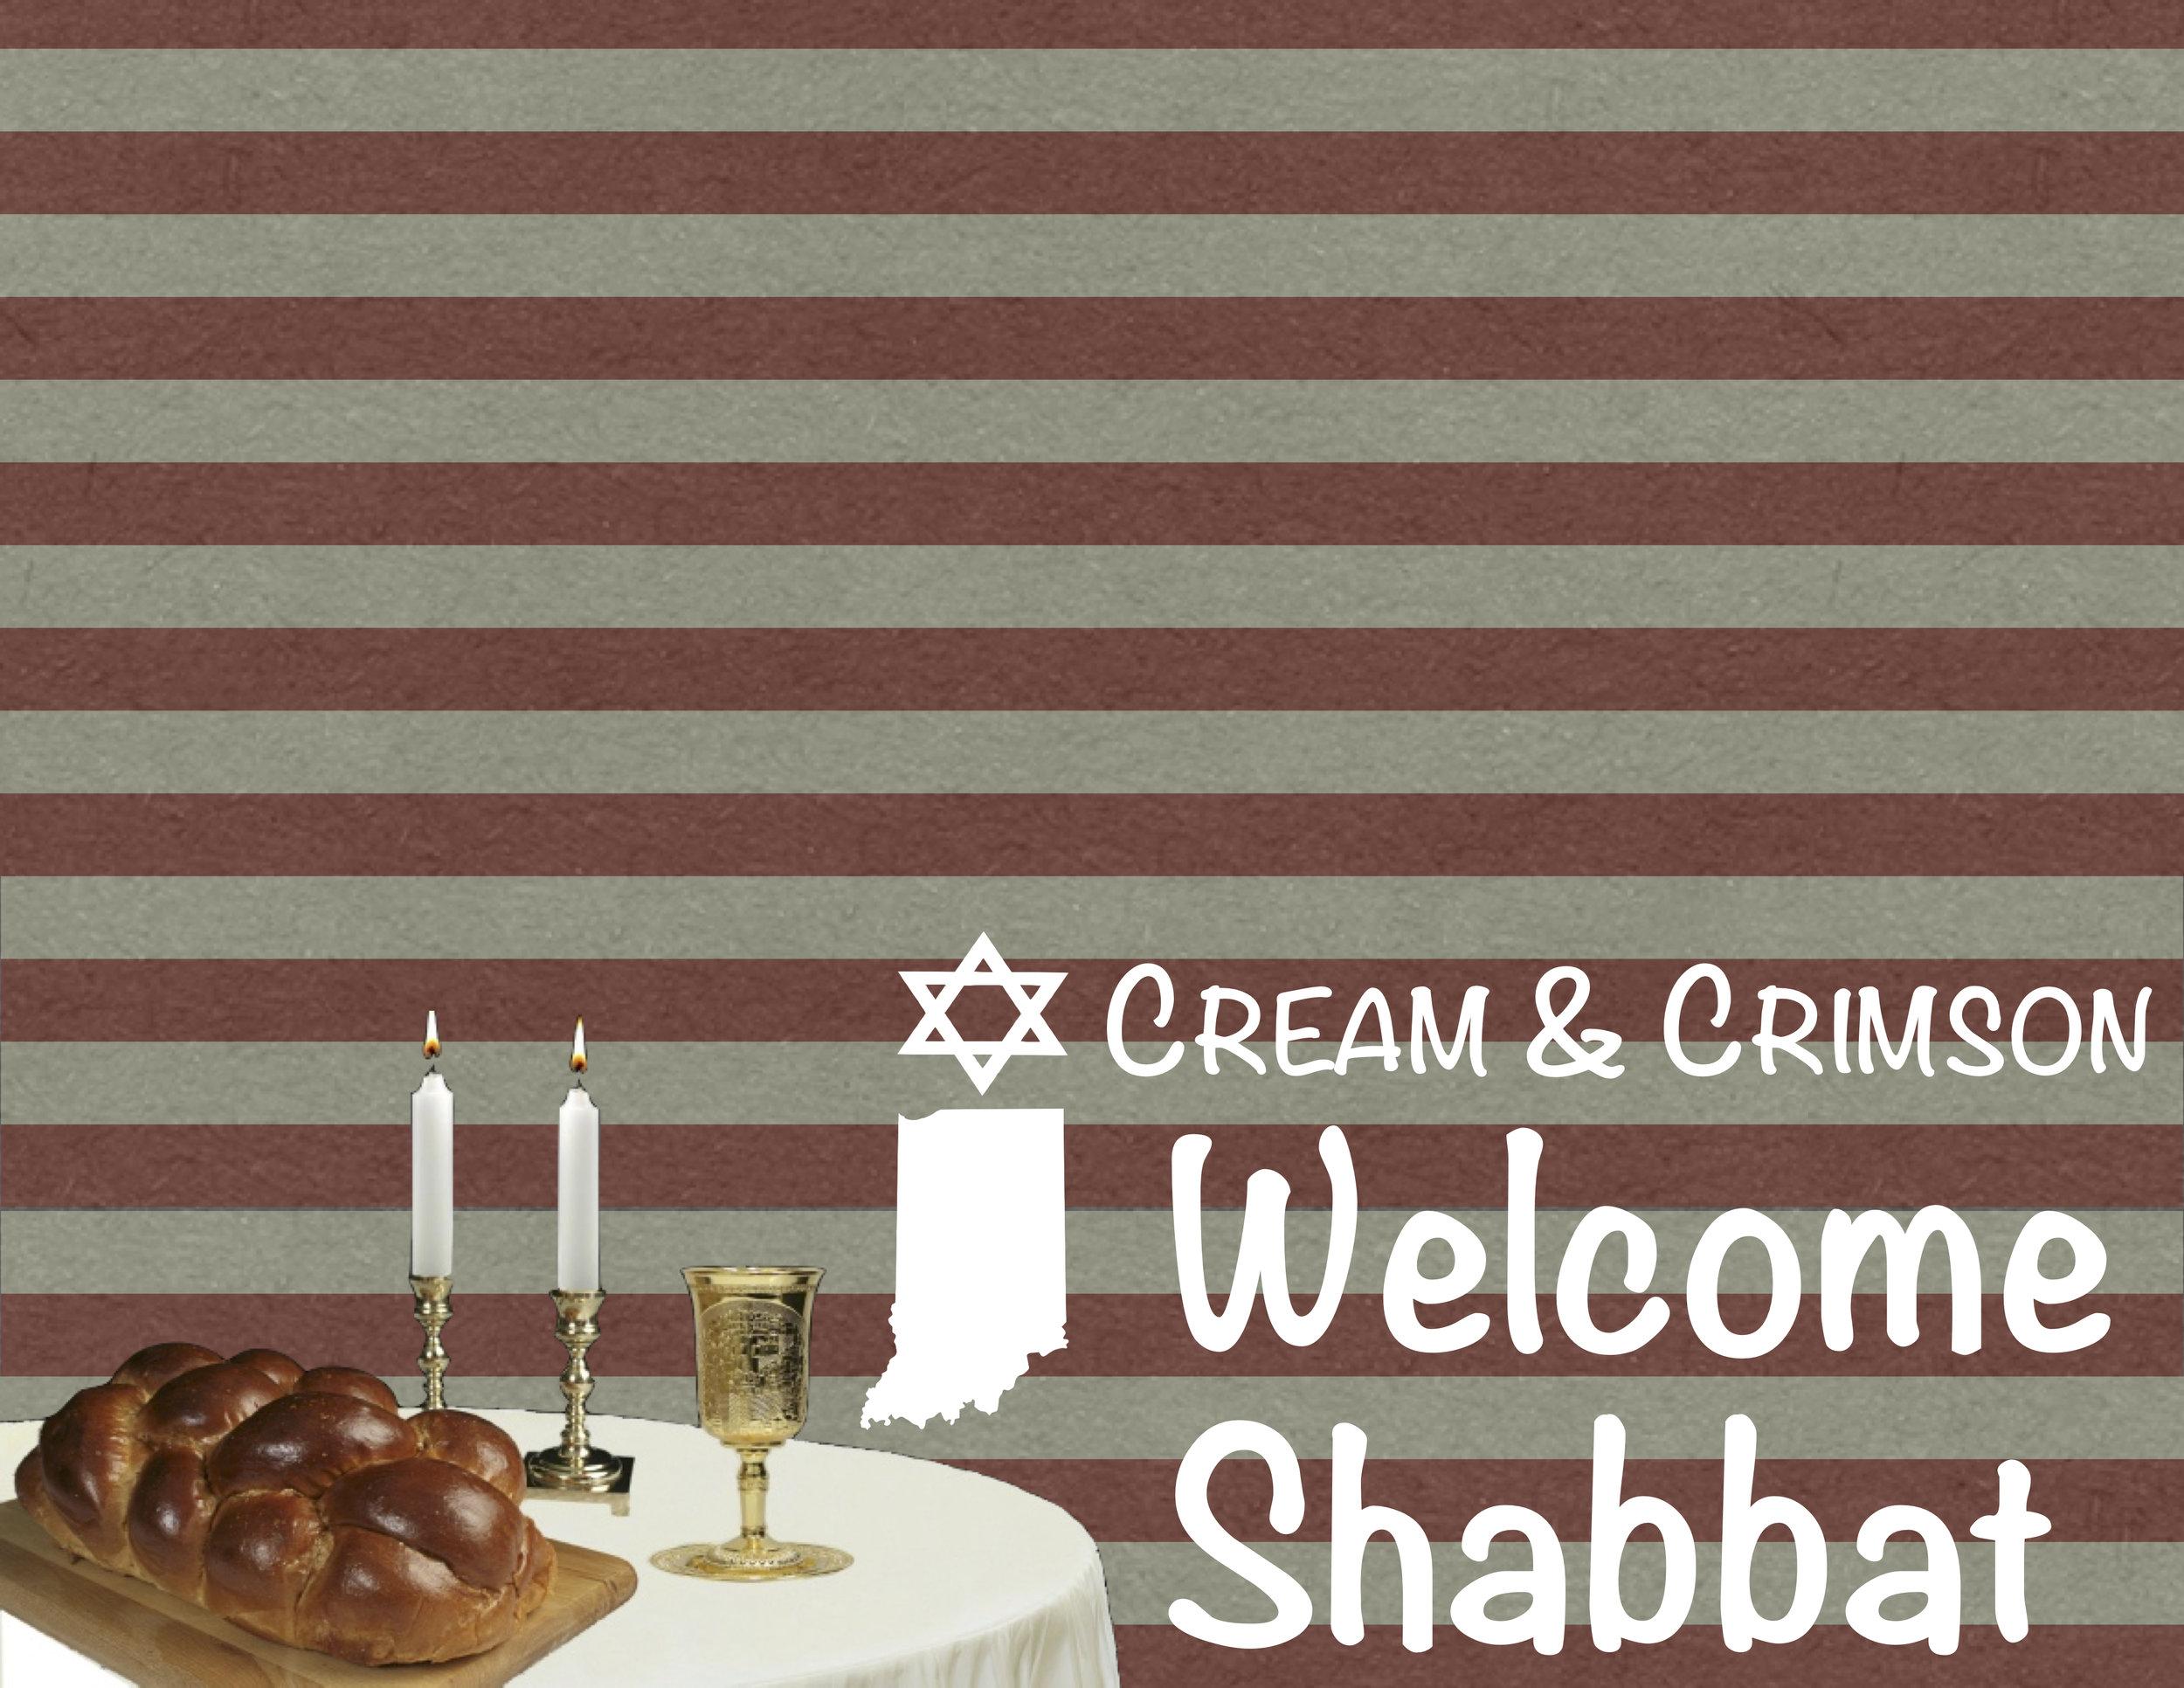 welcome shabbat.jpg